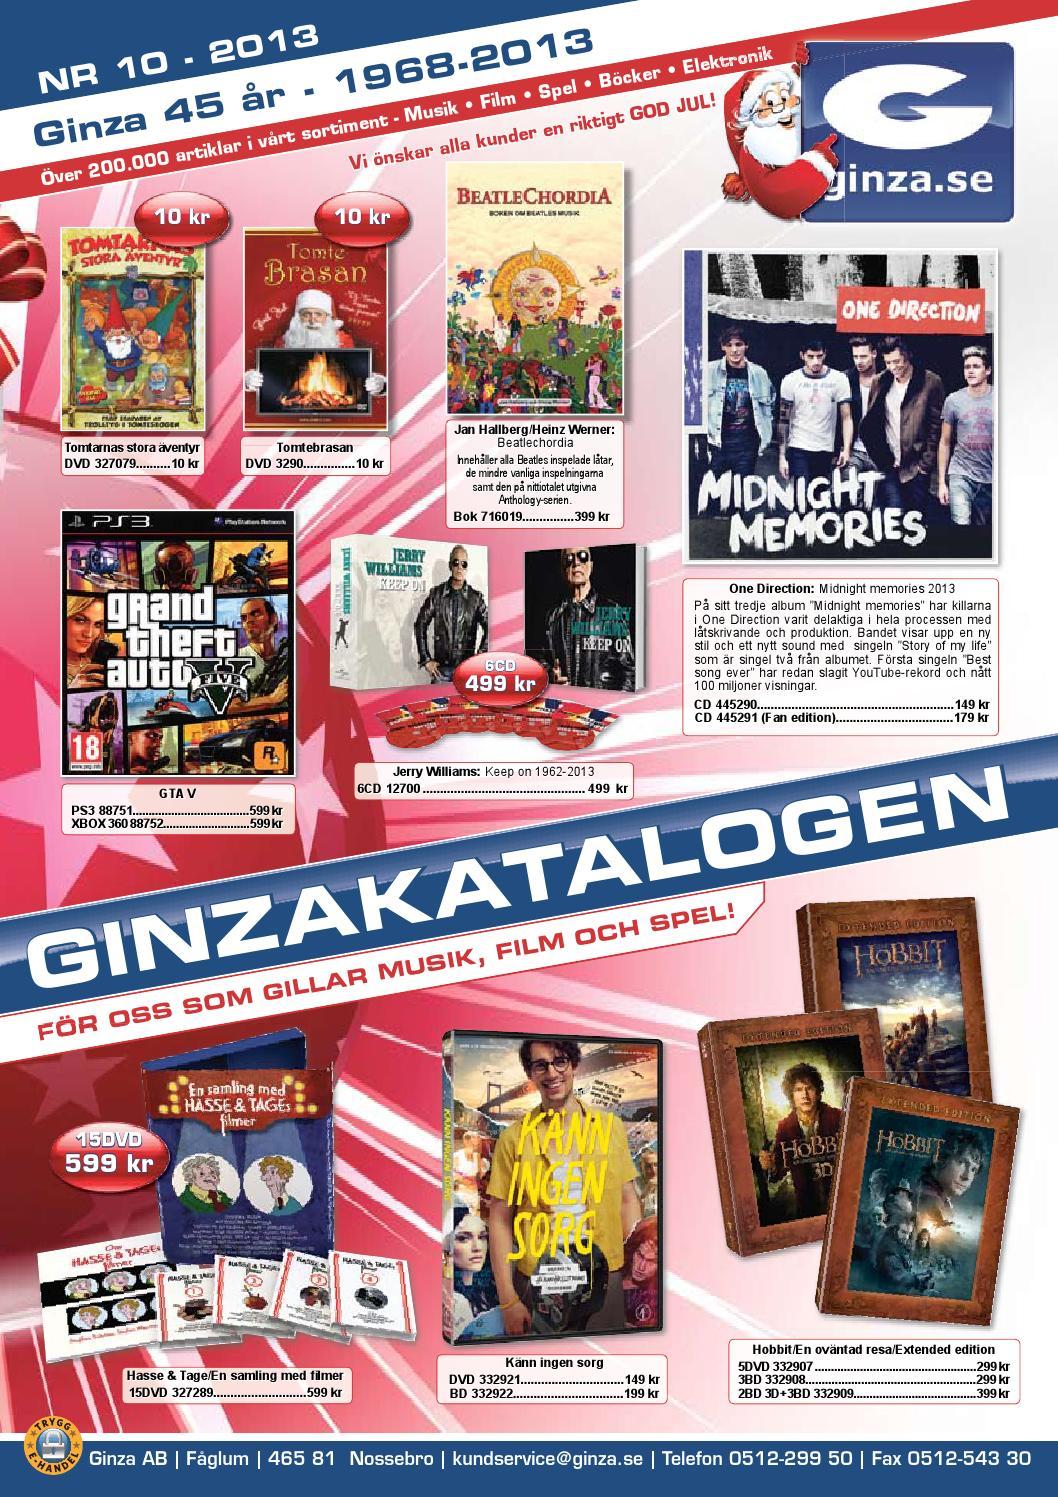 ginzakatalogen nr 10 2015 by ginza ab issuu